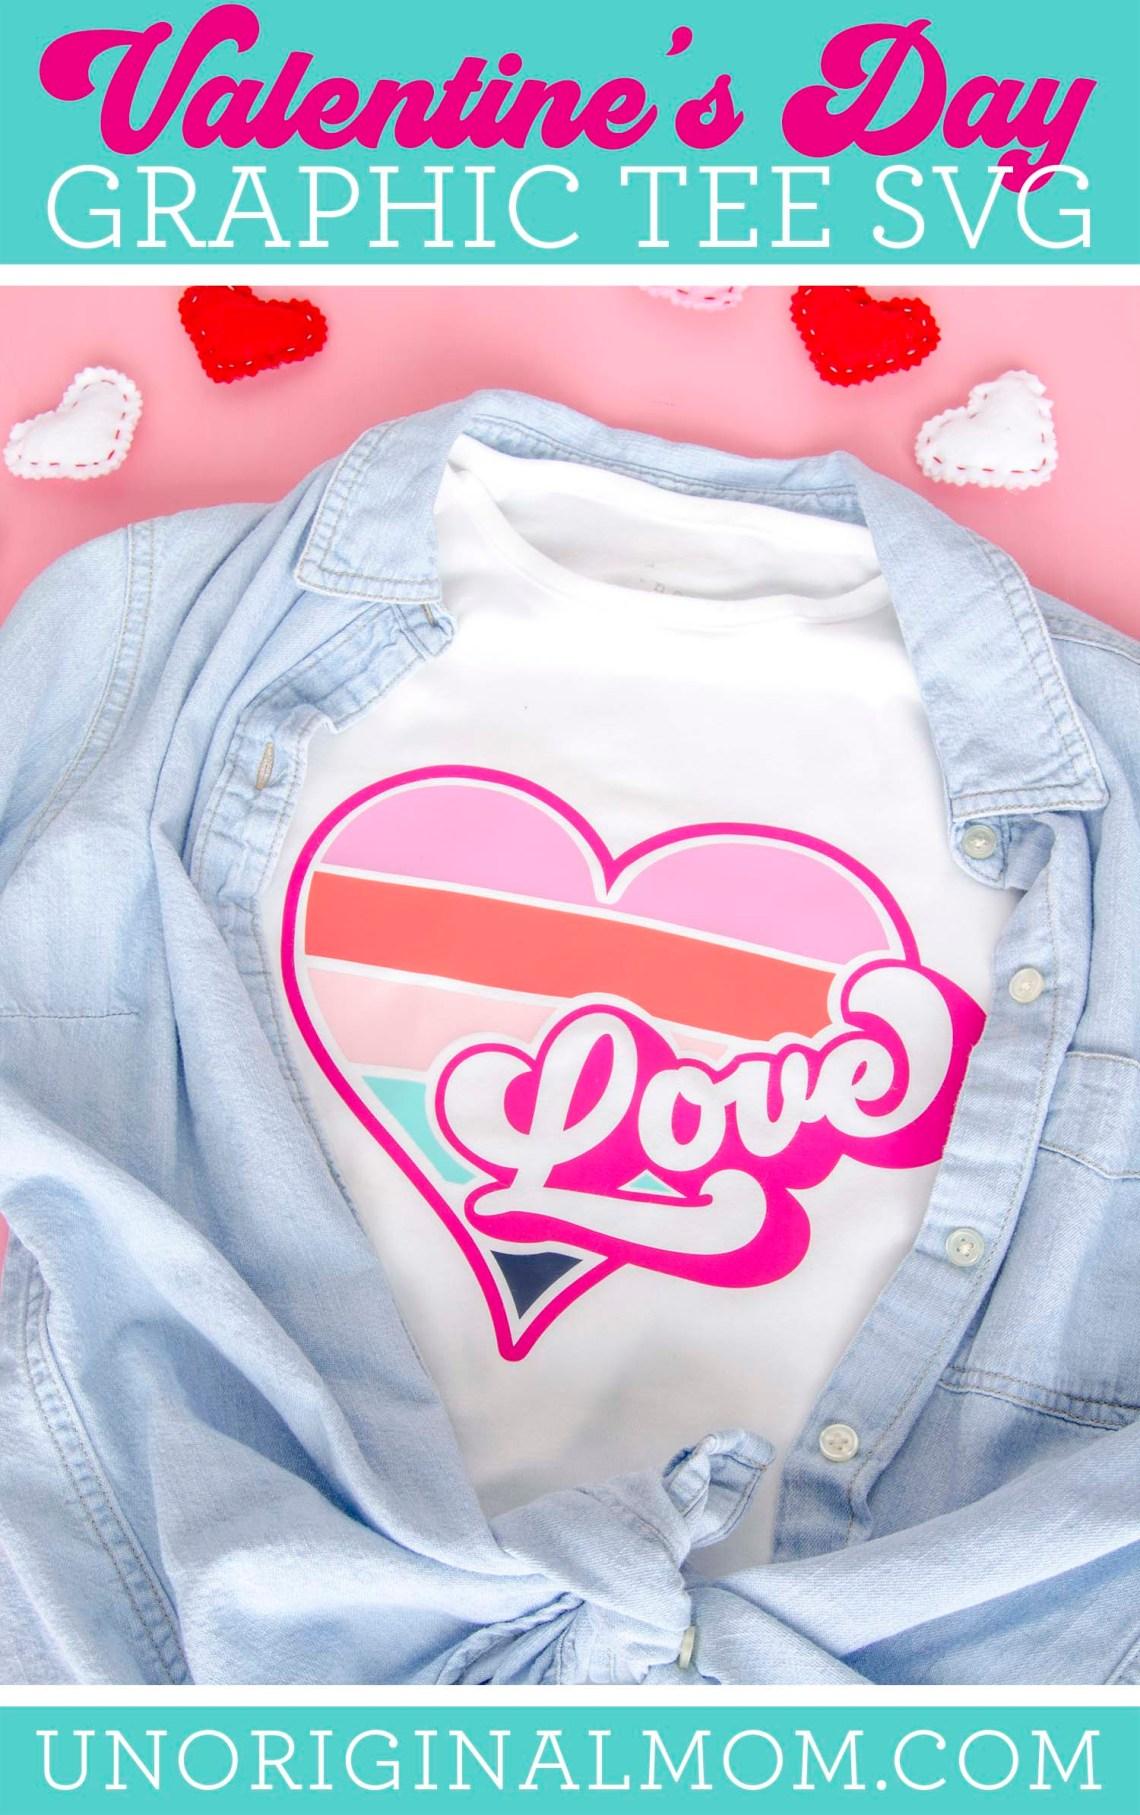 Download Retro Typography Love SVG - unOriginal Mom